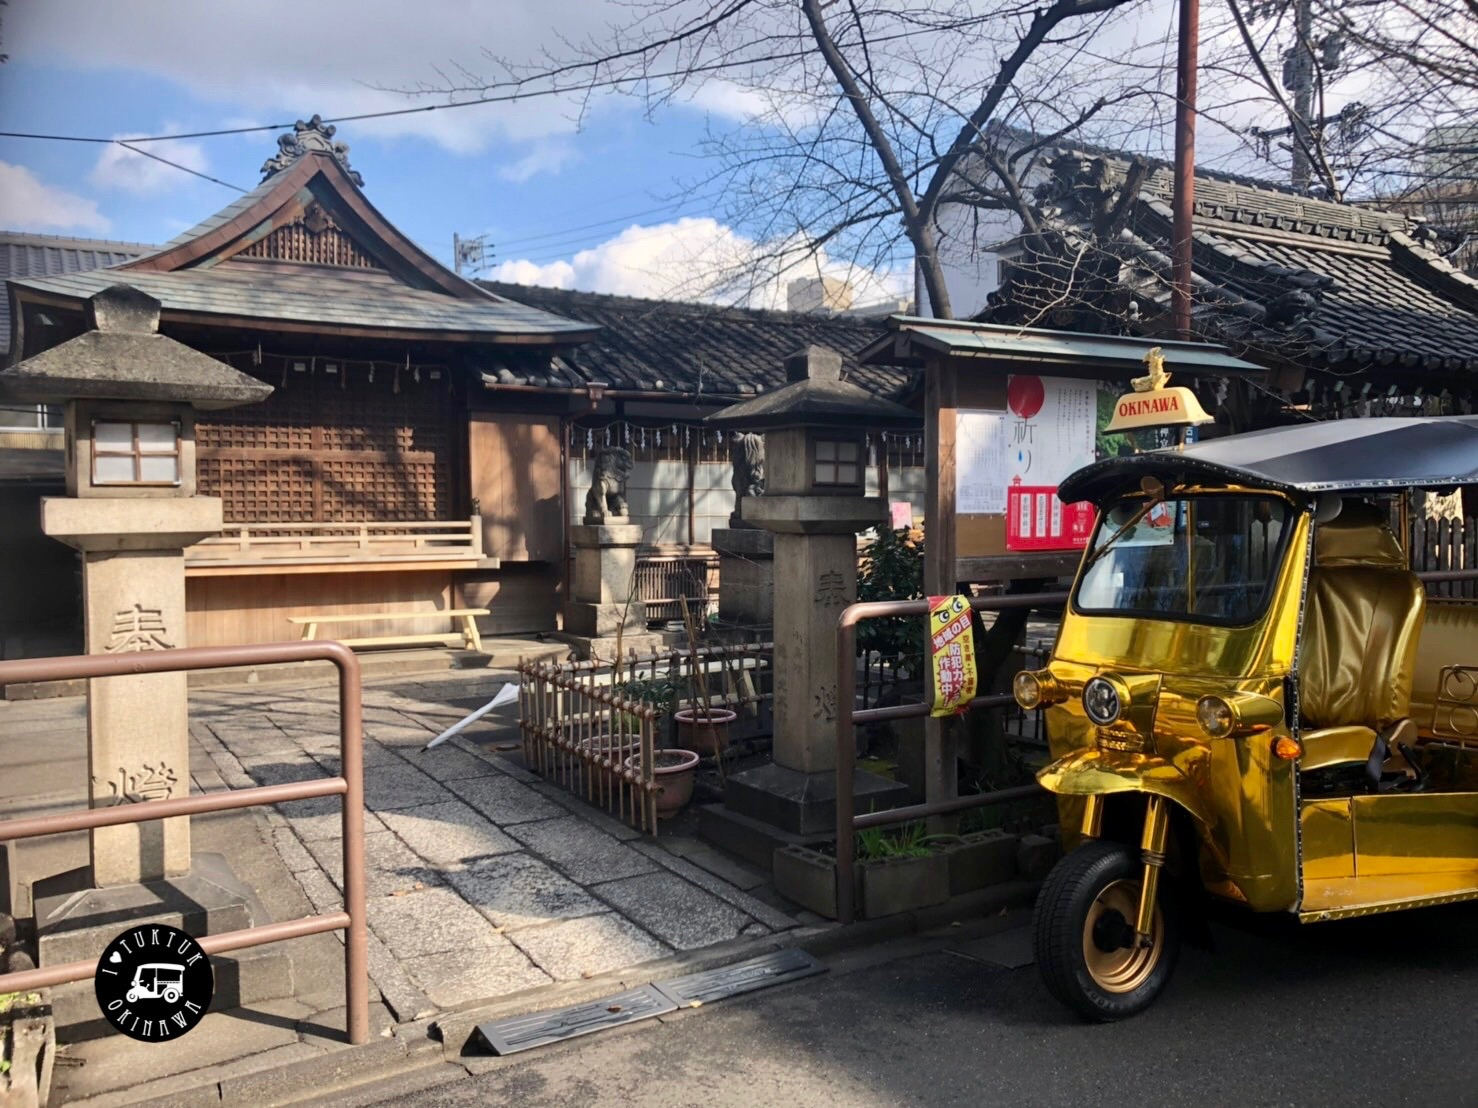 浅間神社(南出入口、正面に神楽殿)